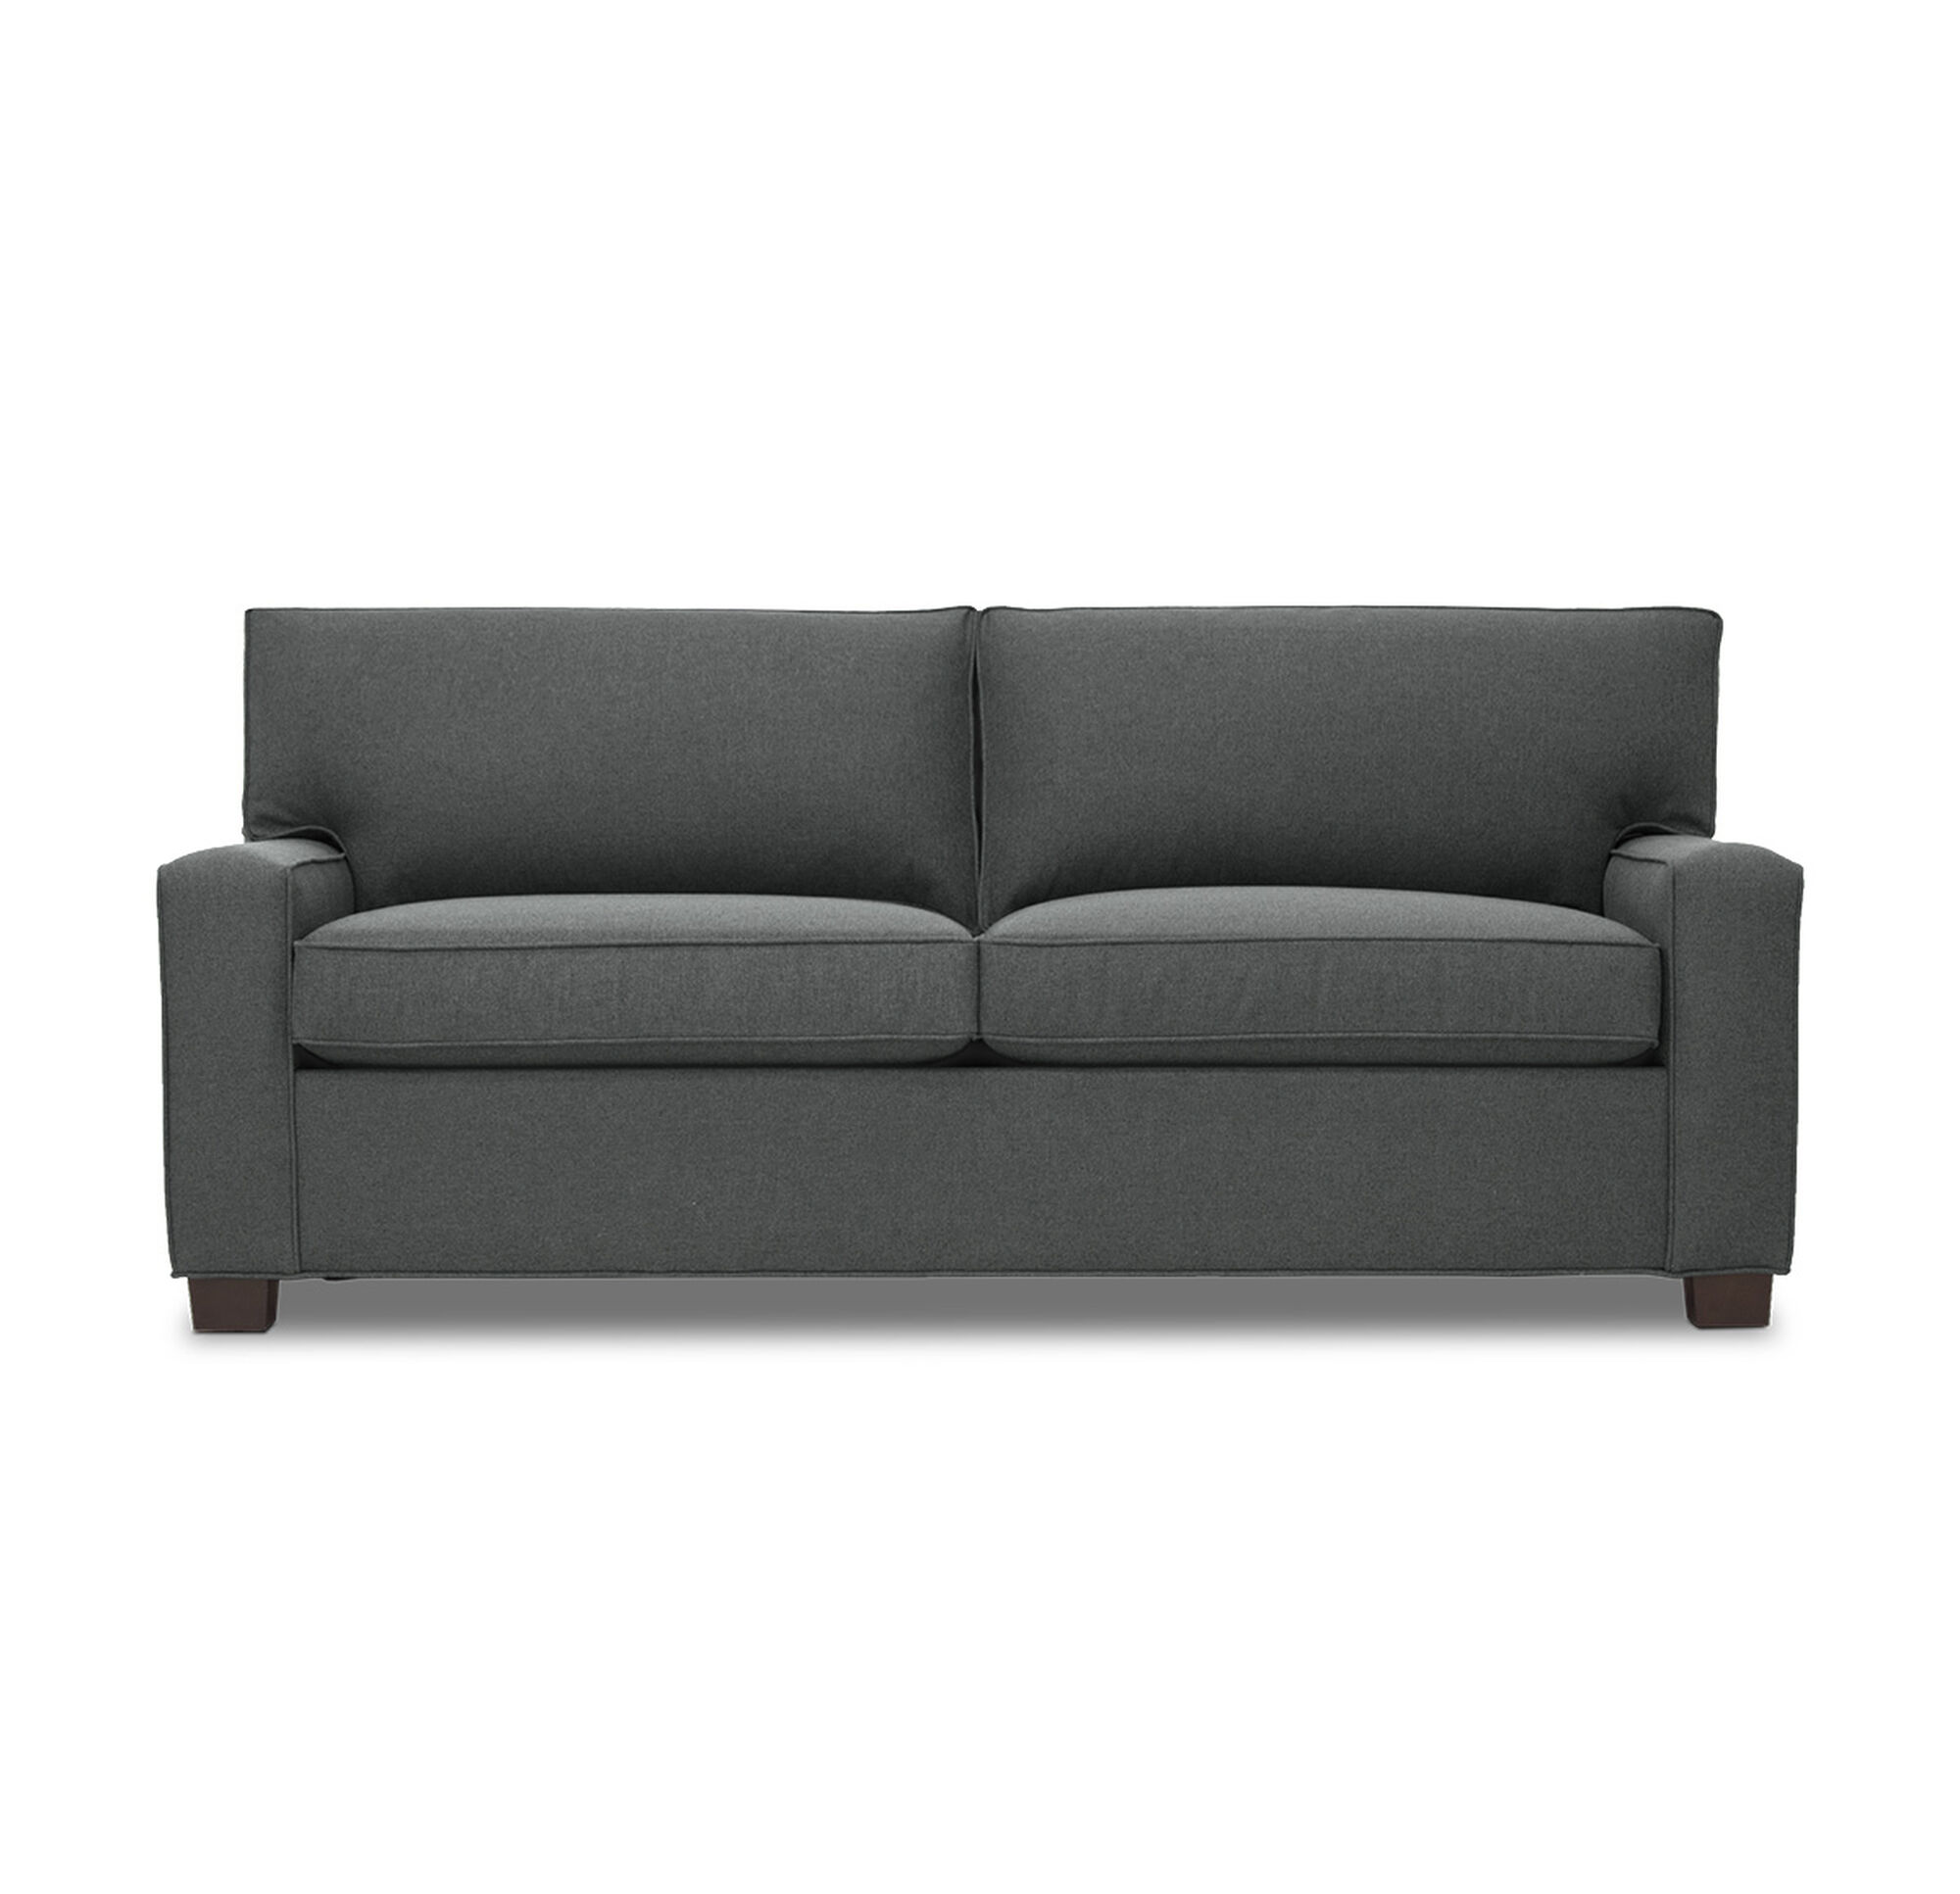 Alex Queen Sleeper Sofa Mitc Gold